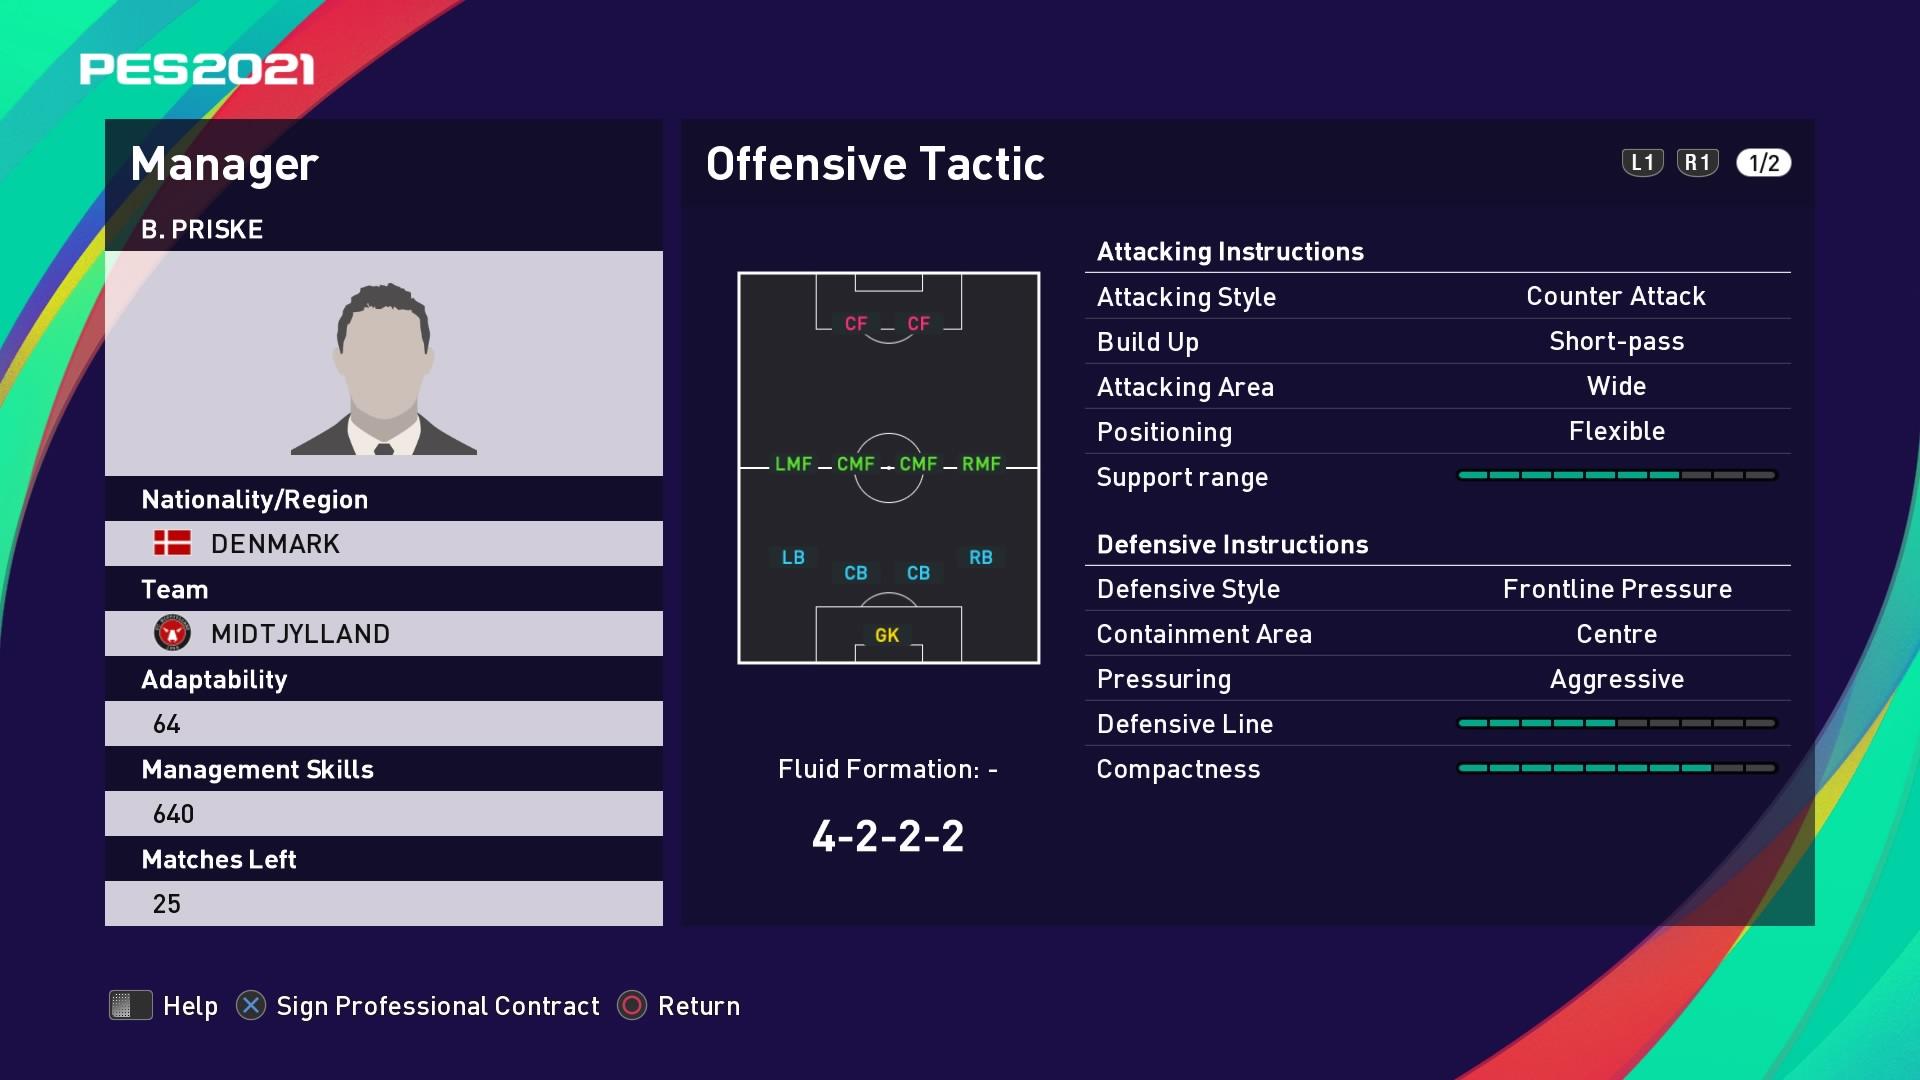 B. Priske (Brian Priske) Offensive Tactic in PES 2021 myClub